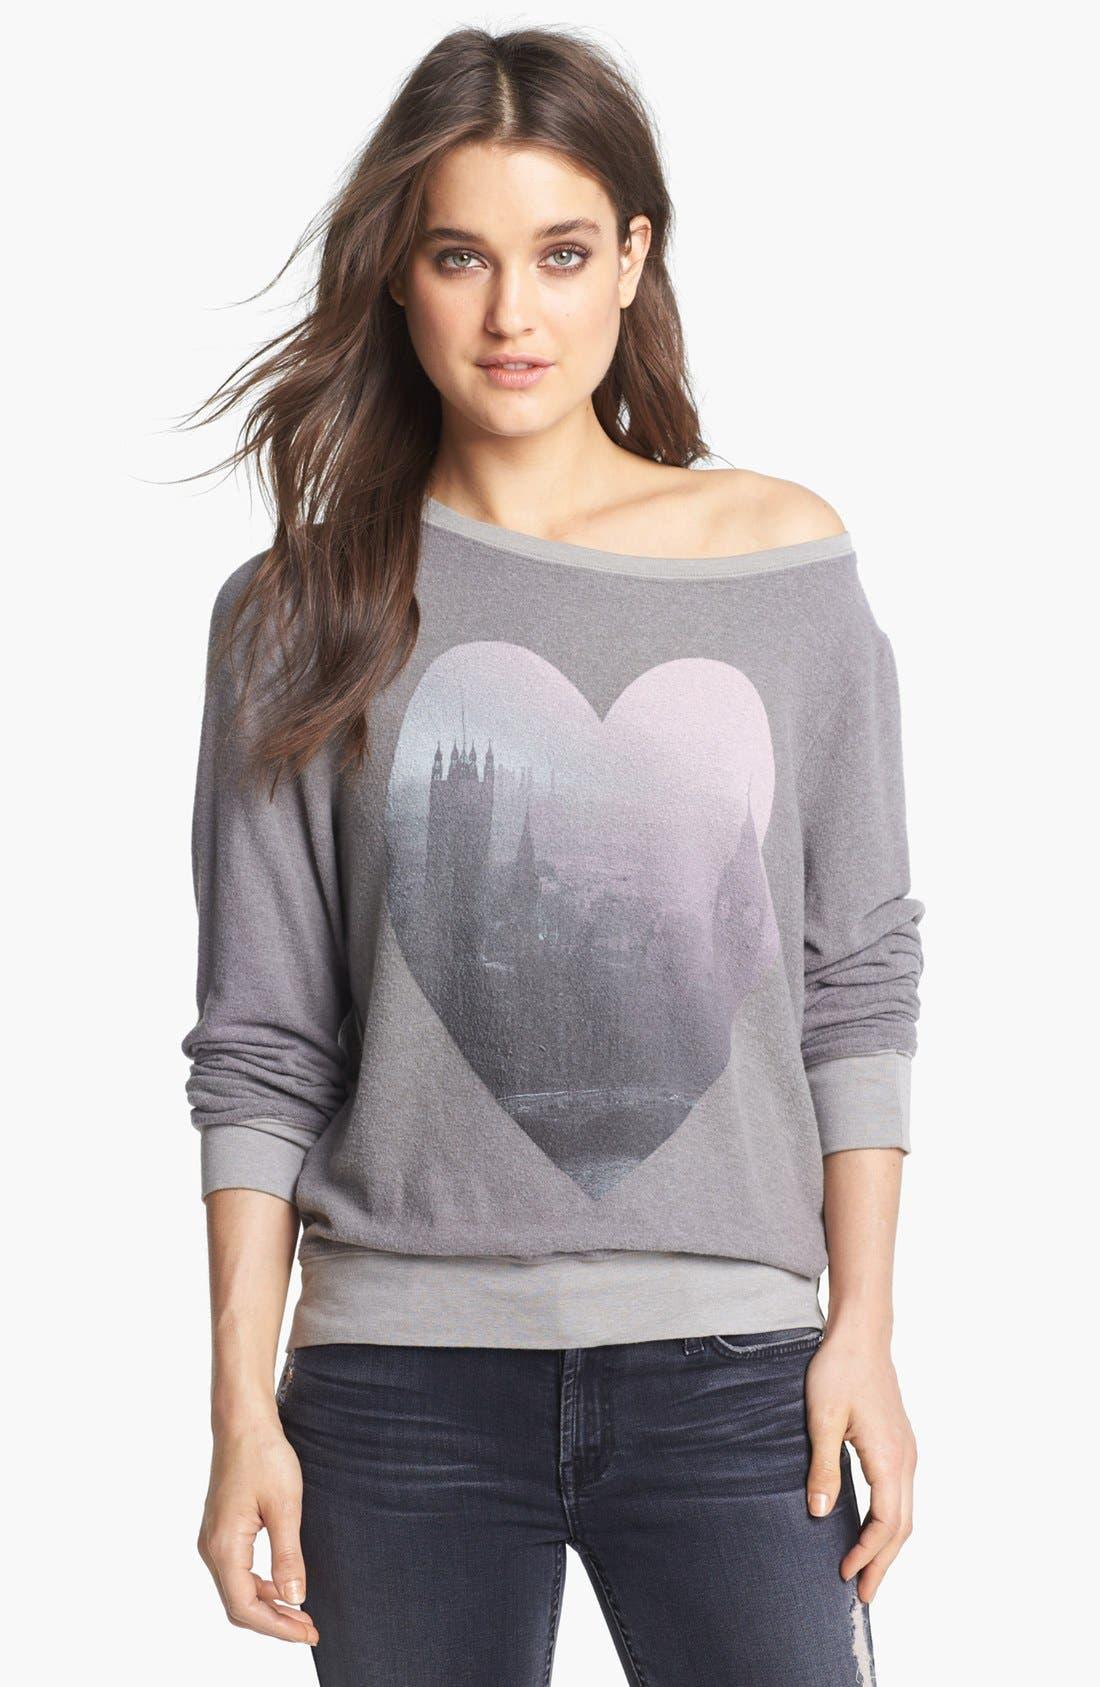 Alternate Image 1 Selected - Wildfox 'London Heart' Sweatshirt (Nordstrom Exclusive)